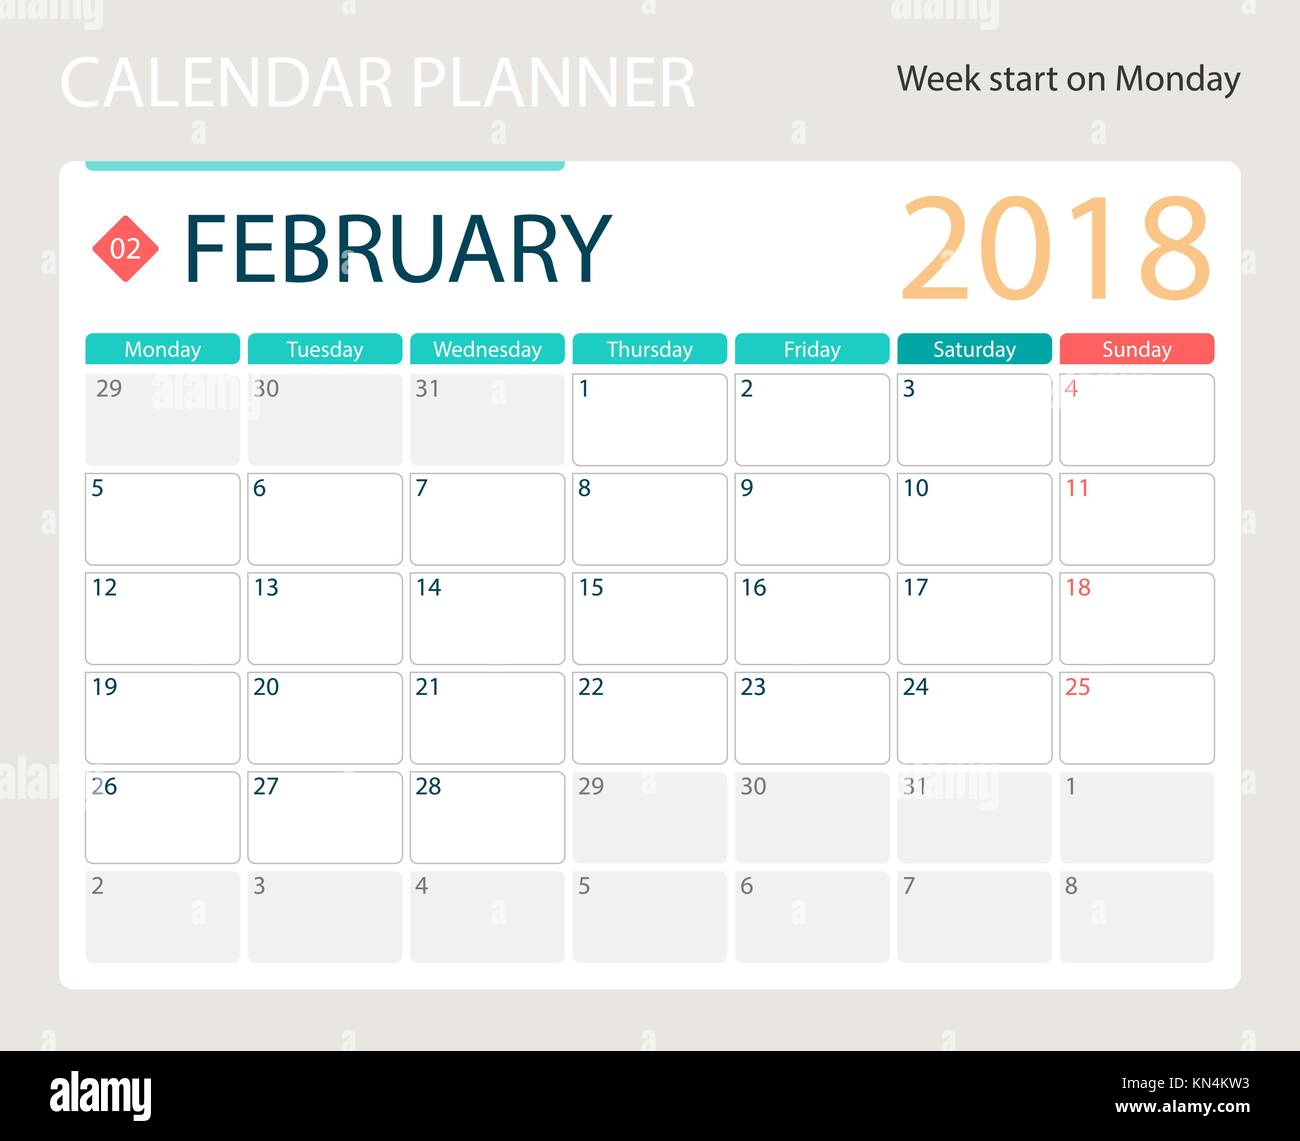 February Calendar Illustration : February stock vector images alamy